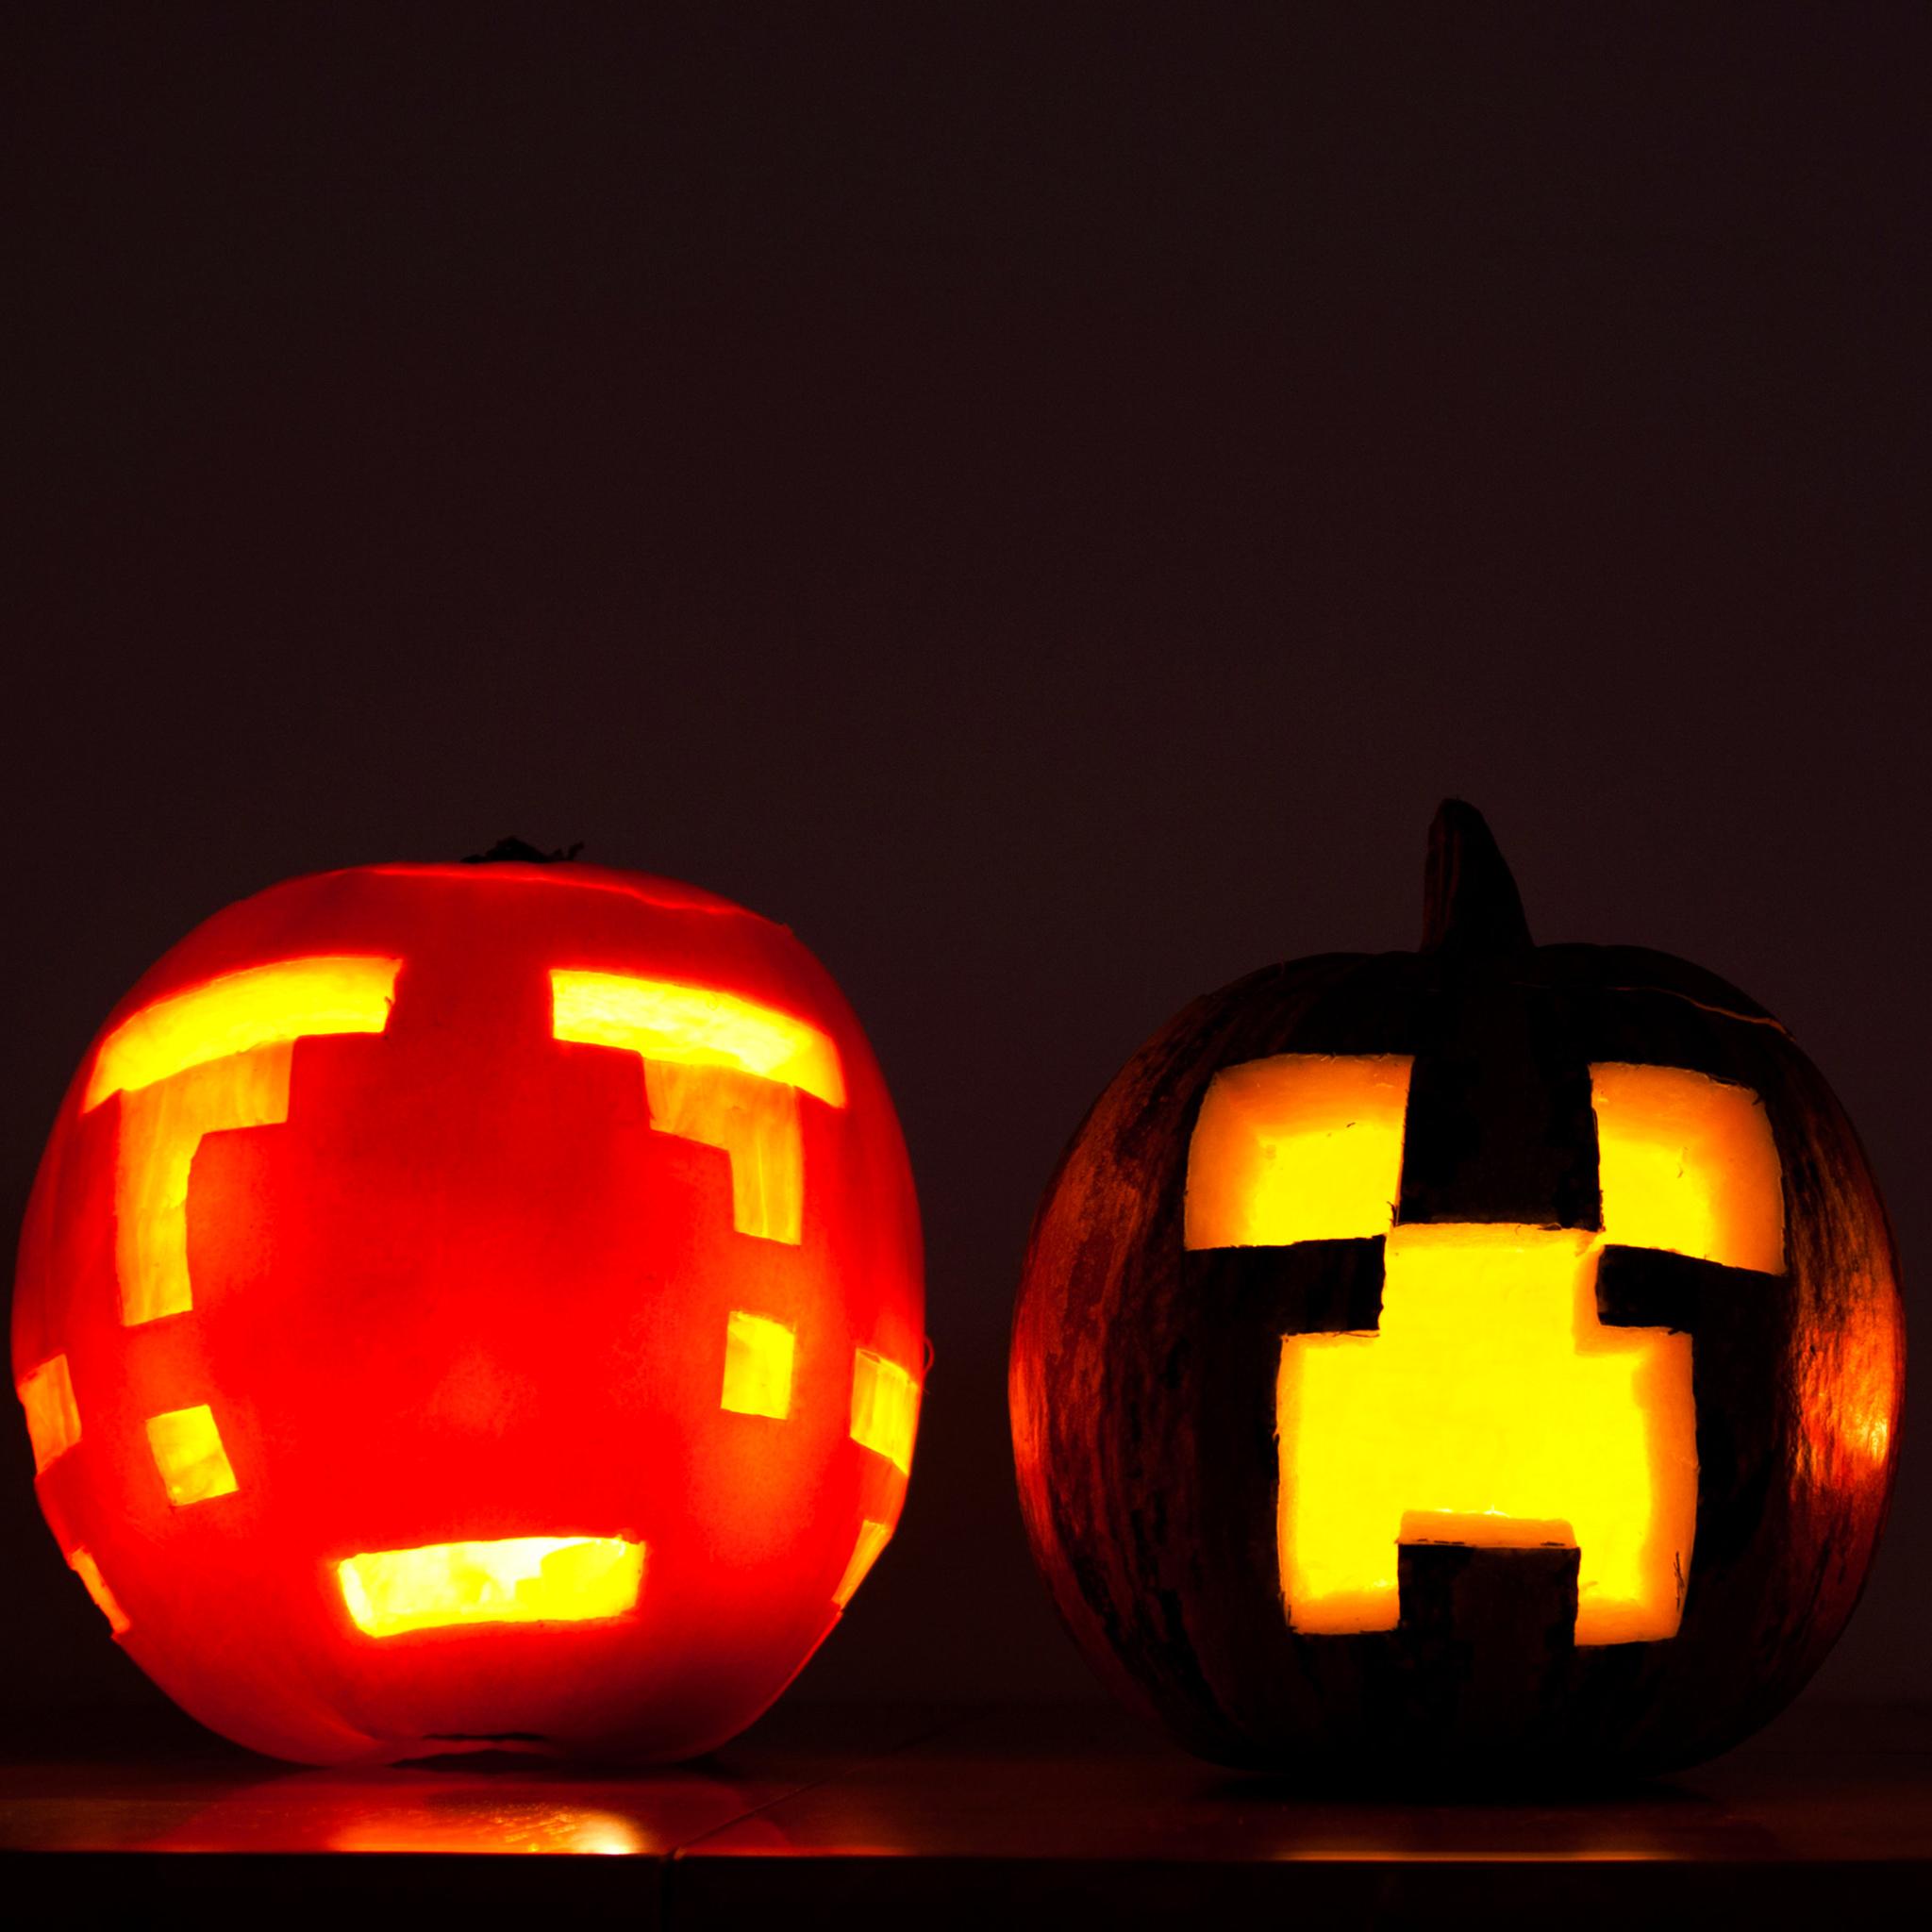 Pixels-Pumpkins-Halloween-3Wallpapers-ipad-Retina